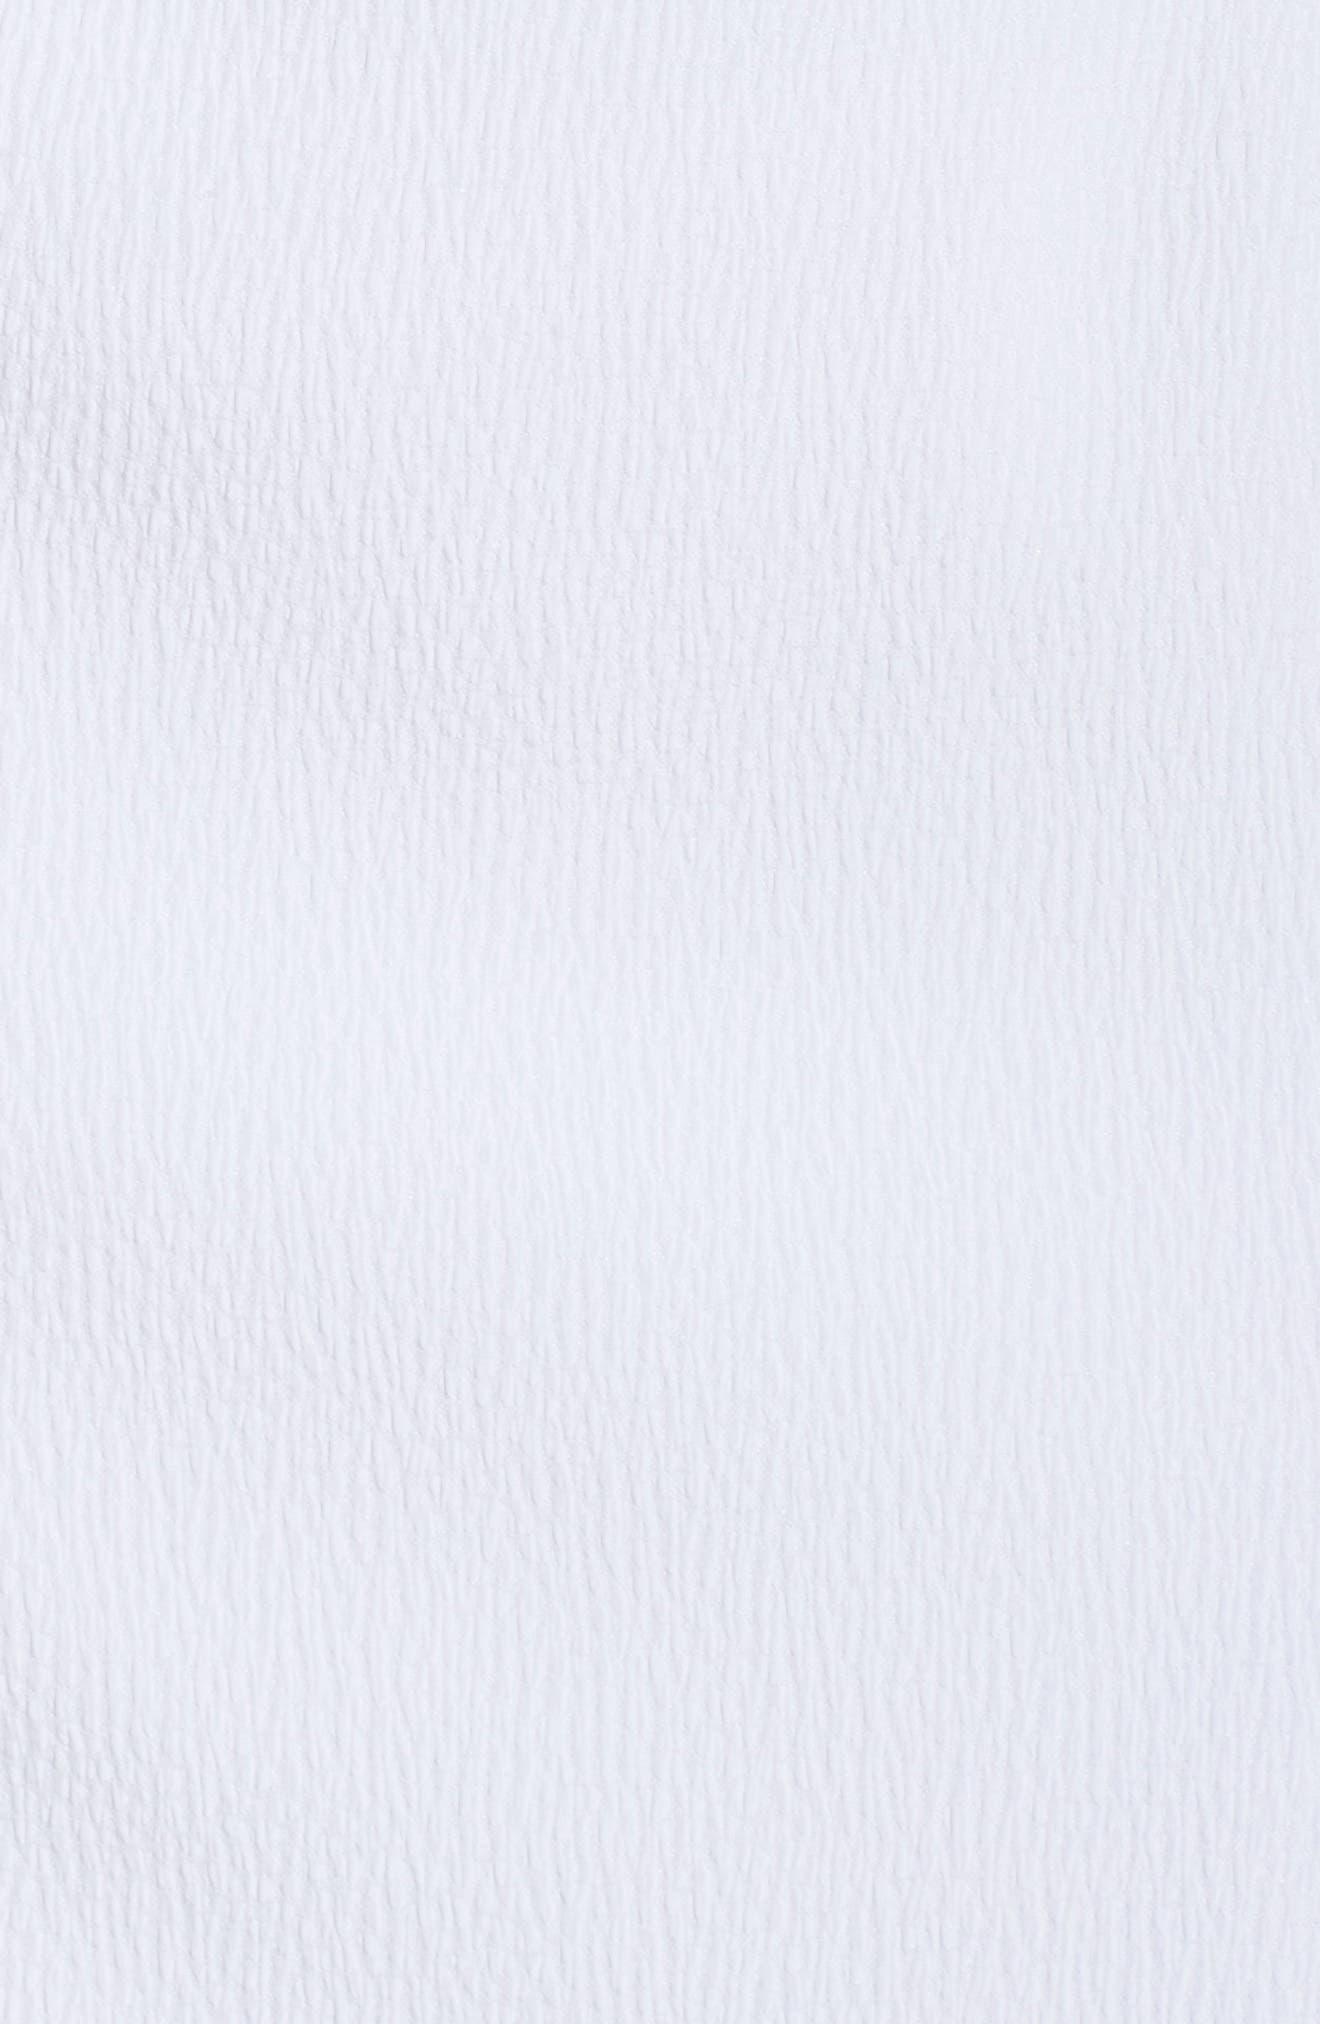 CHELSEA28, Popover Crop Sheath Dress, Alternate thumbnail 6, color, WHITE SNOW